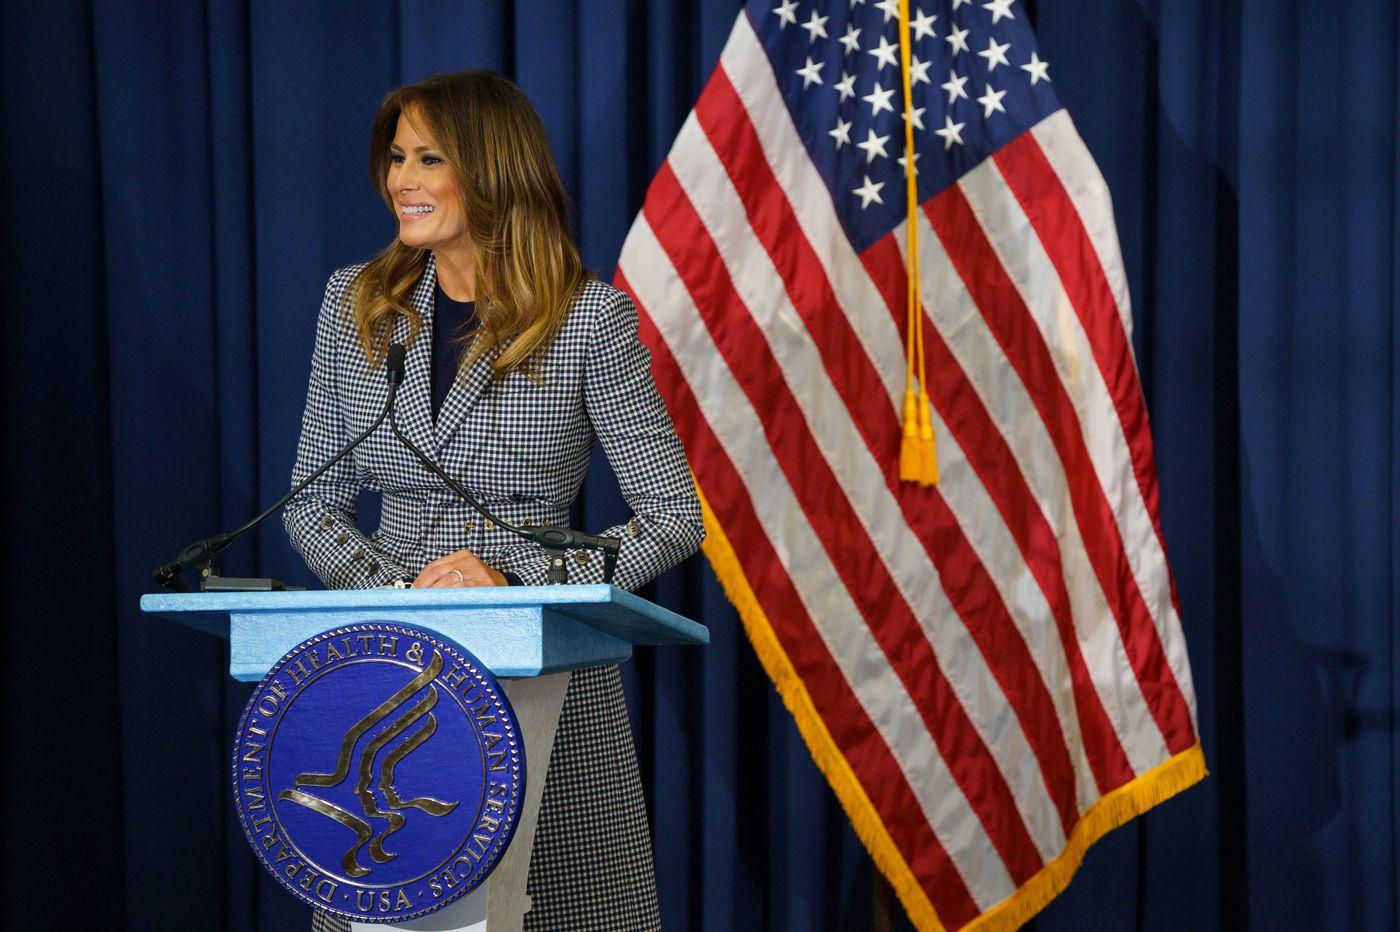 First lady Melania Trump visits Philadelphia to highlight opioid-exposed newborns